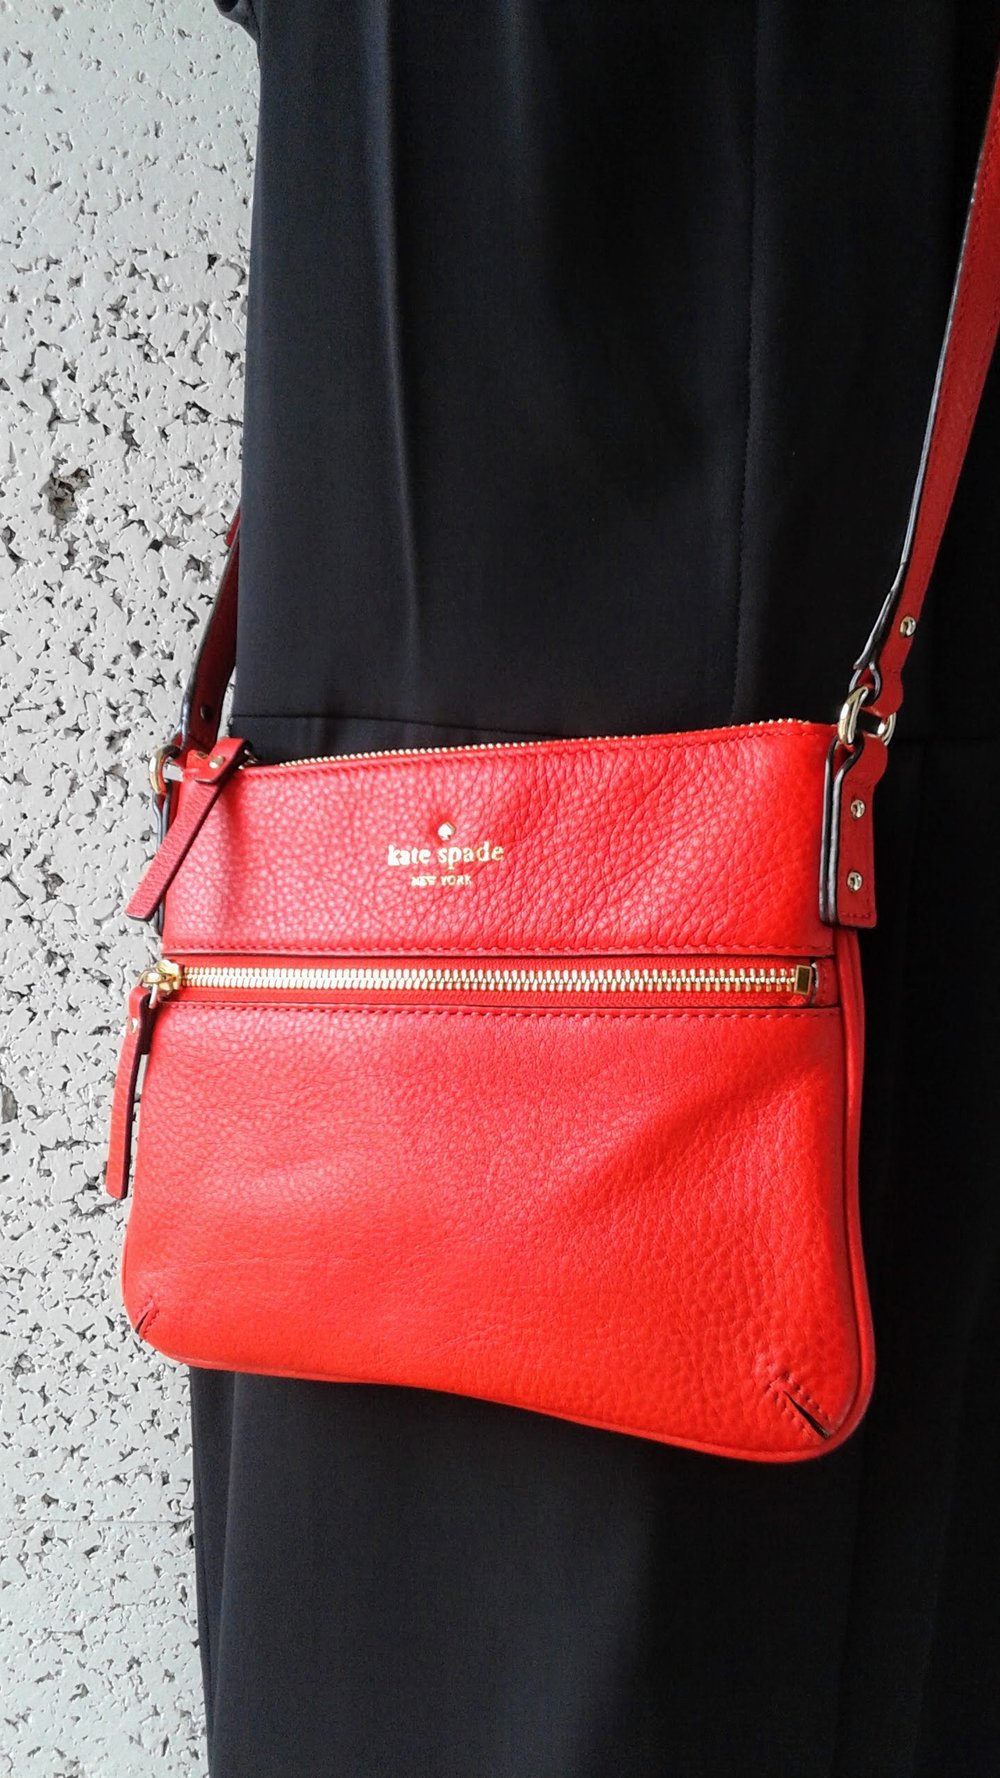 Kate Spade purse, $65